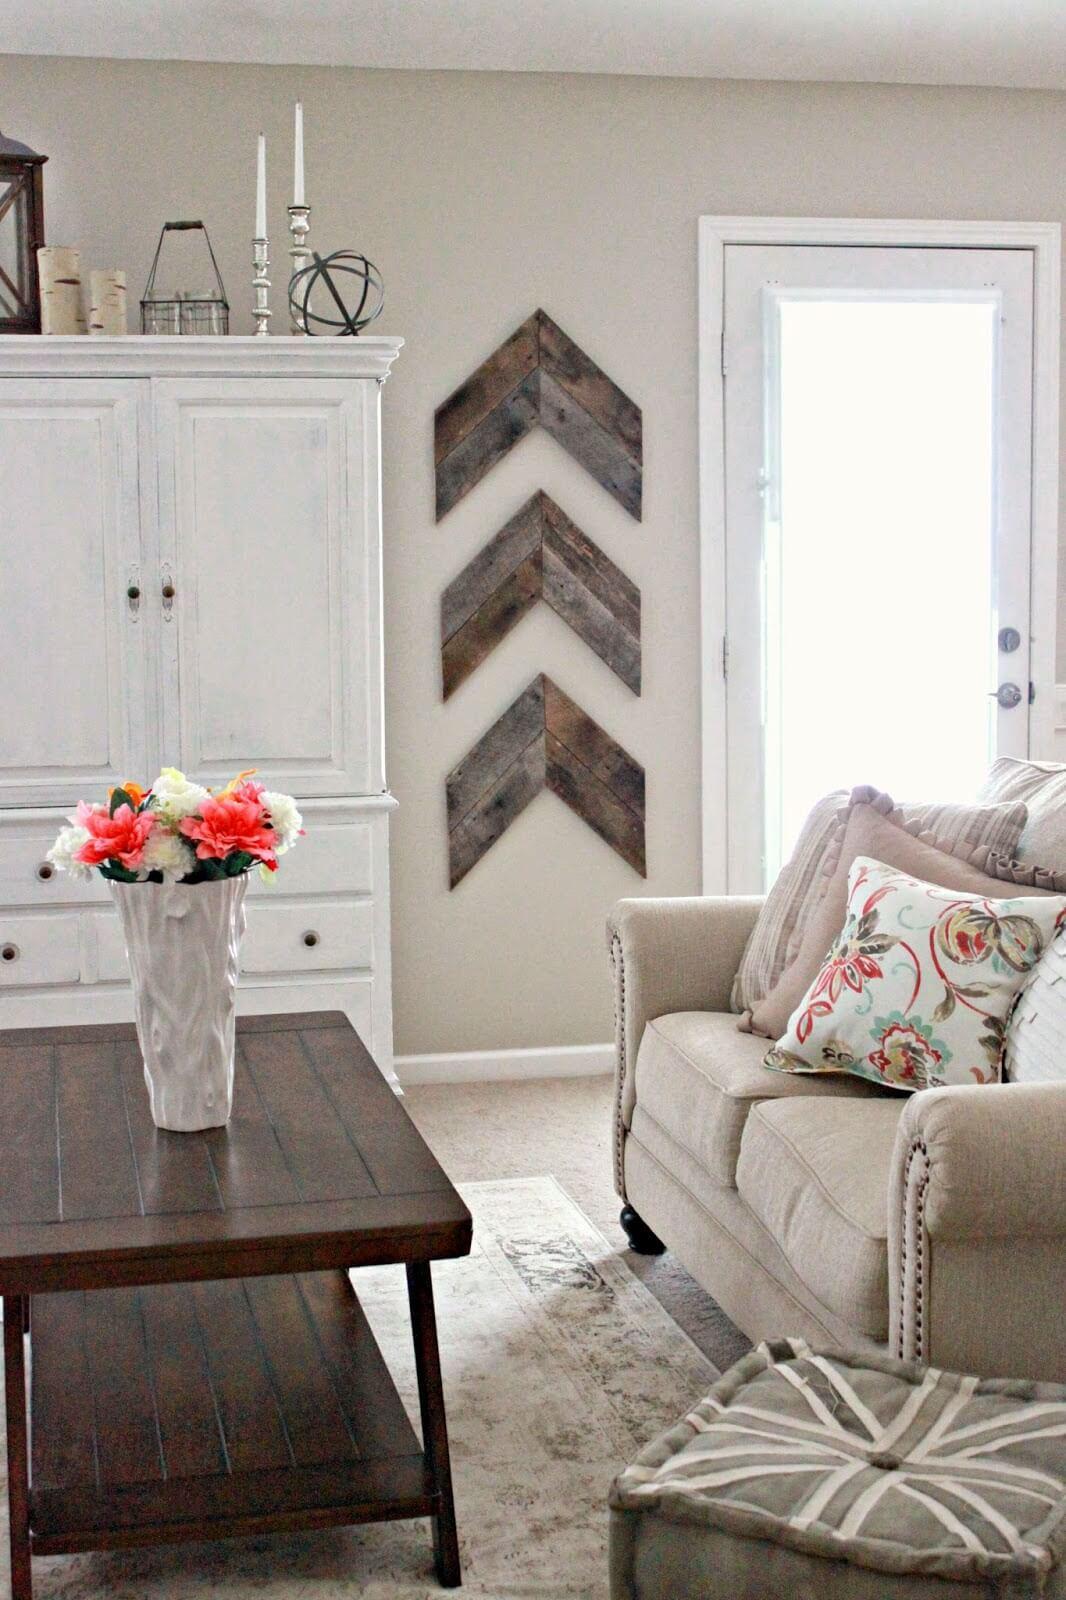 Rustic Chevron Wooden Wall Art